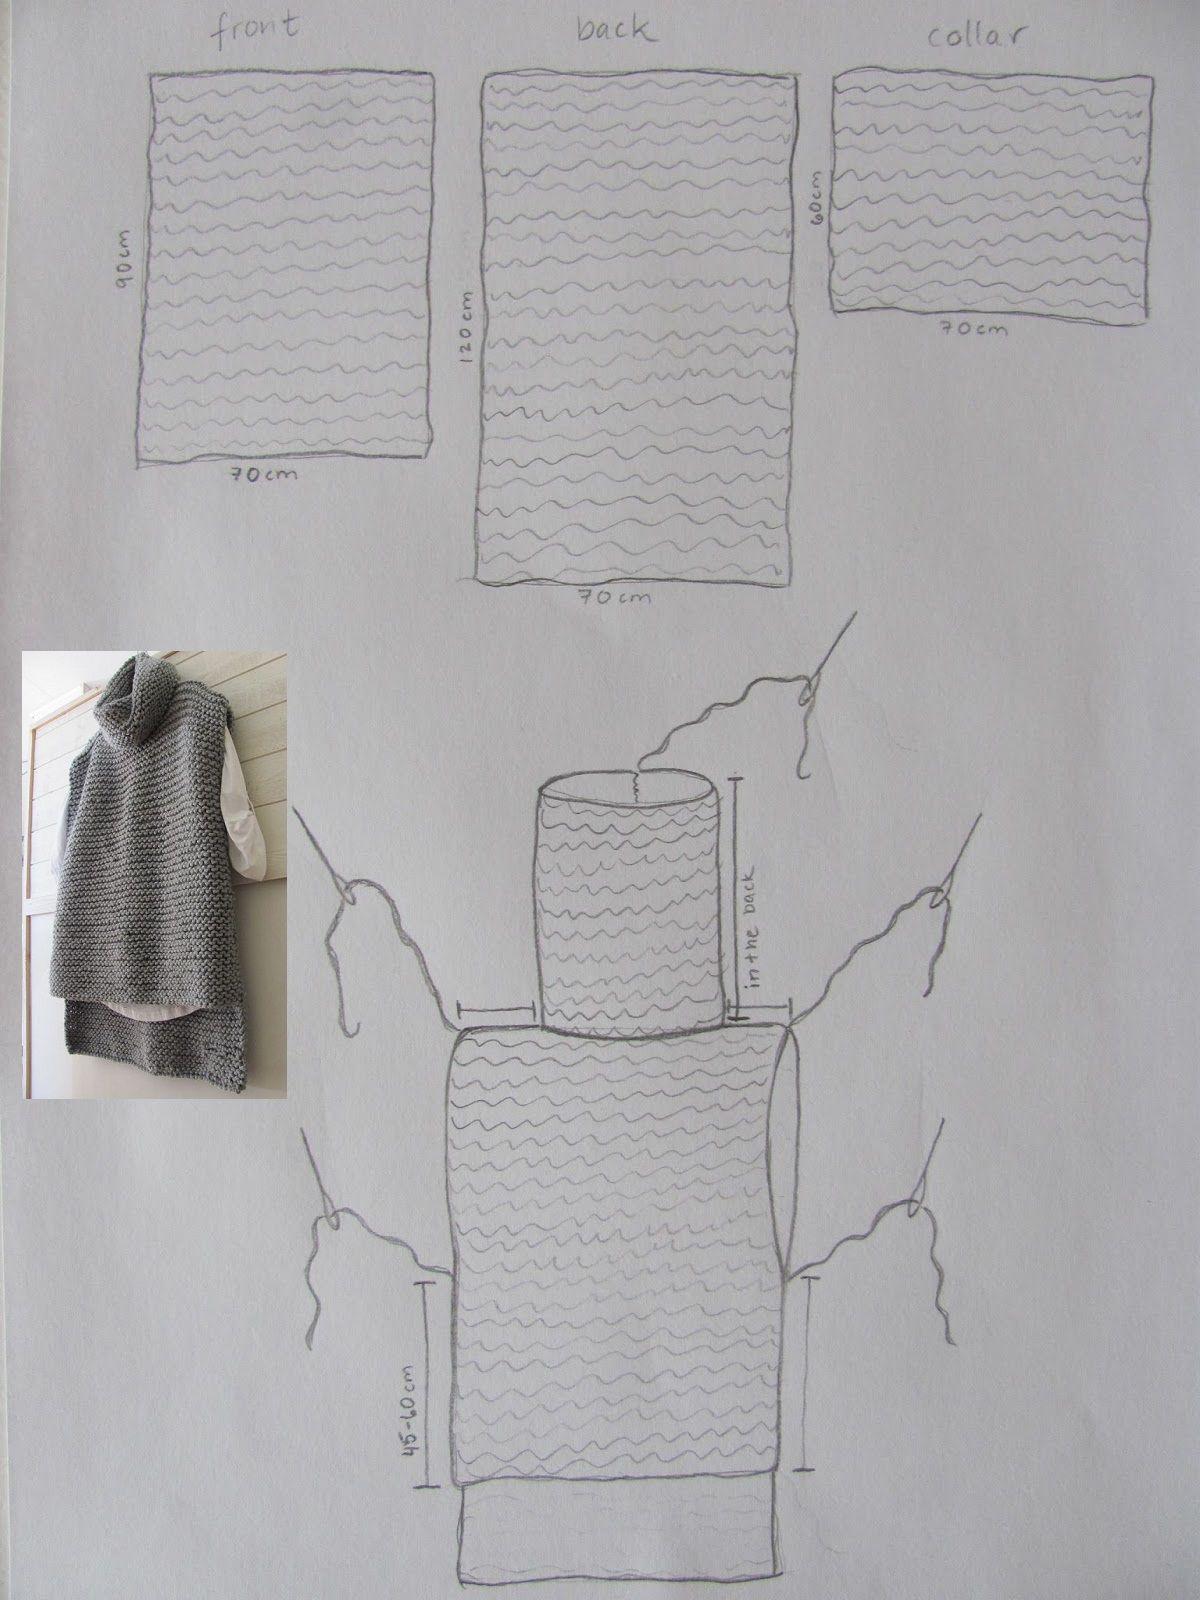 Chaleco crochet | Proyectos que debo intentar | Pinterest | Chaleco ...